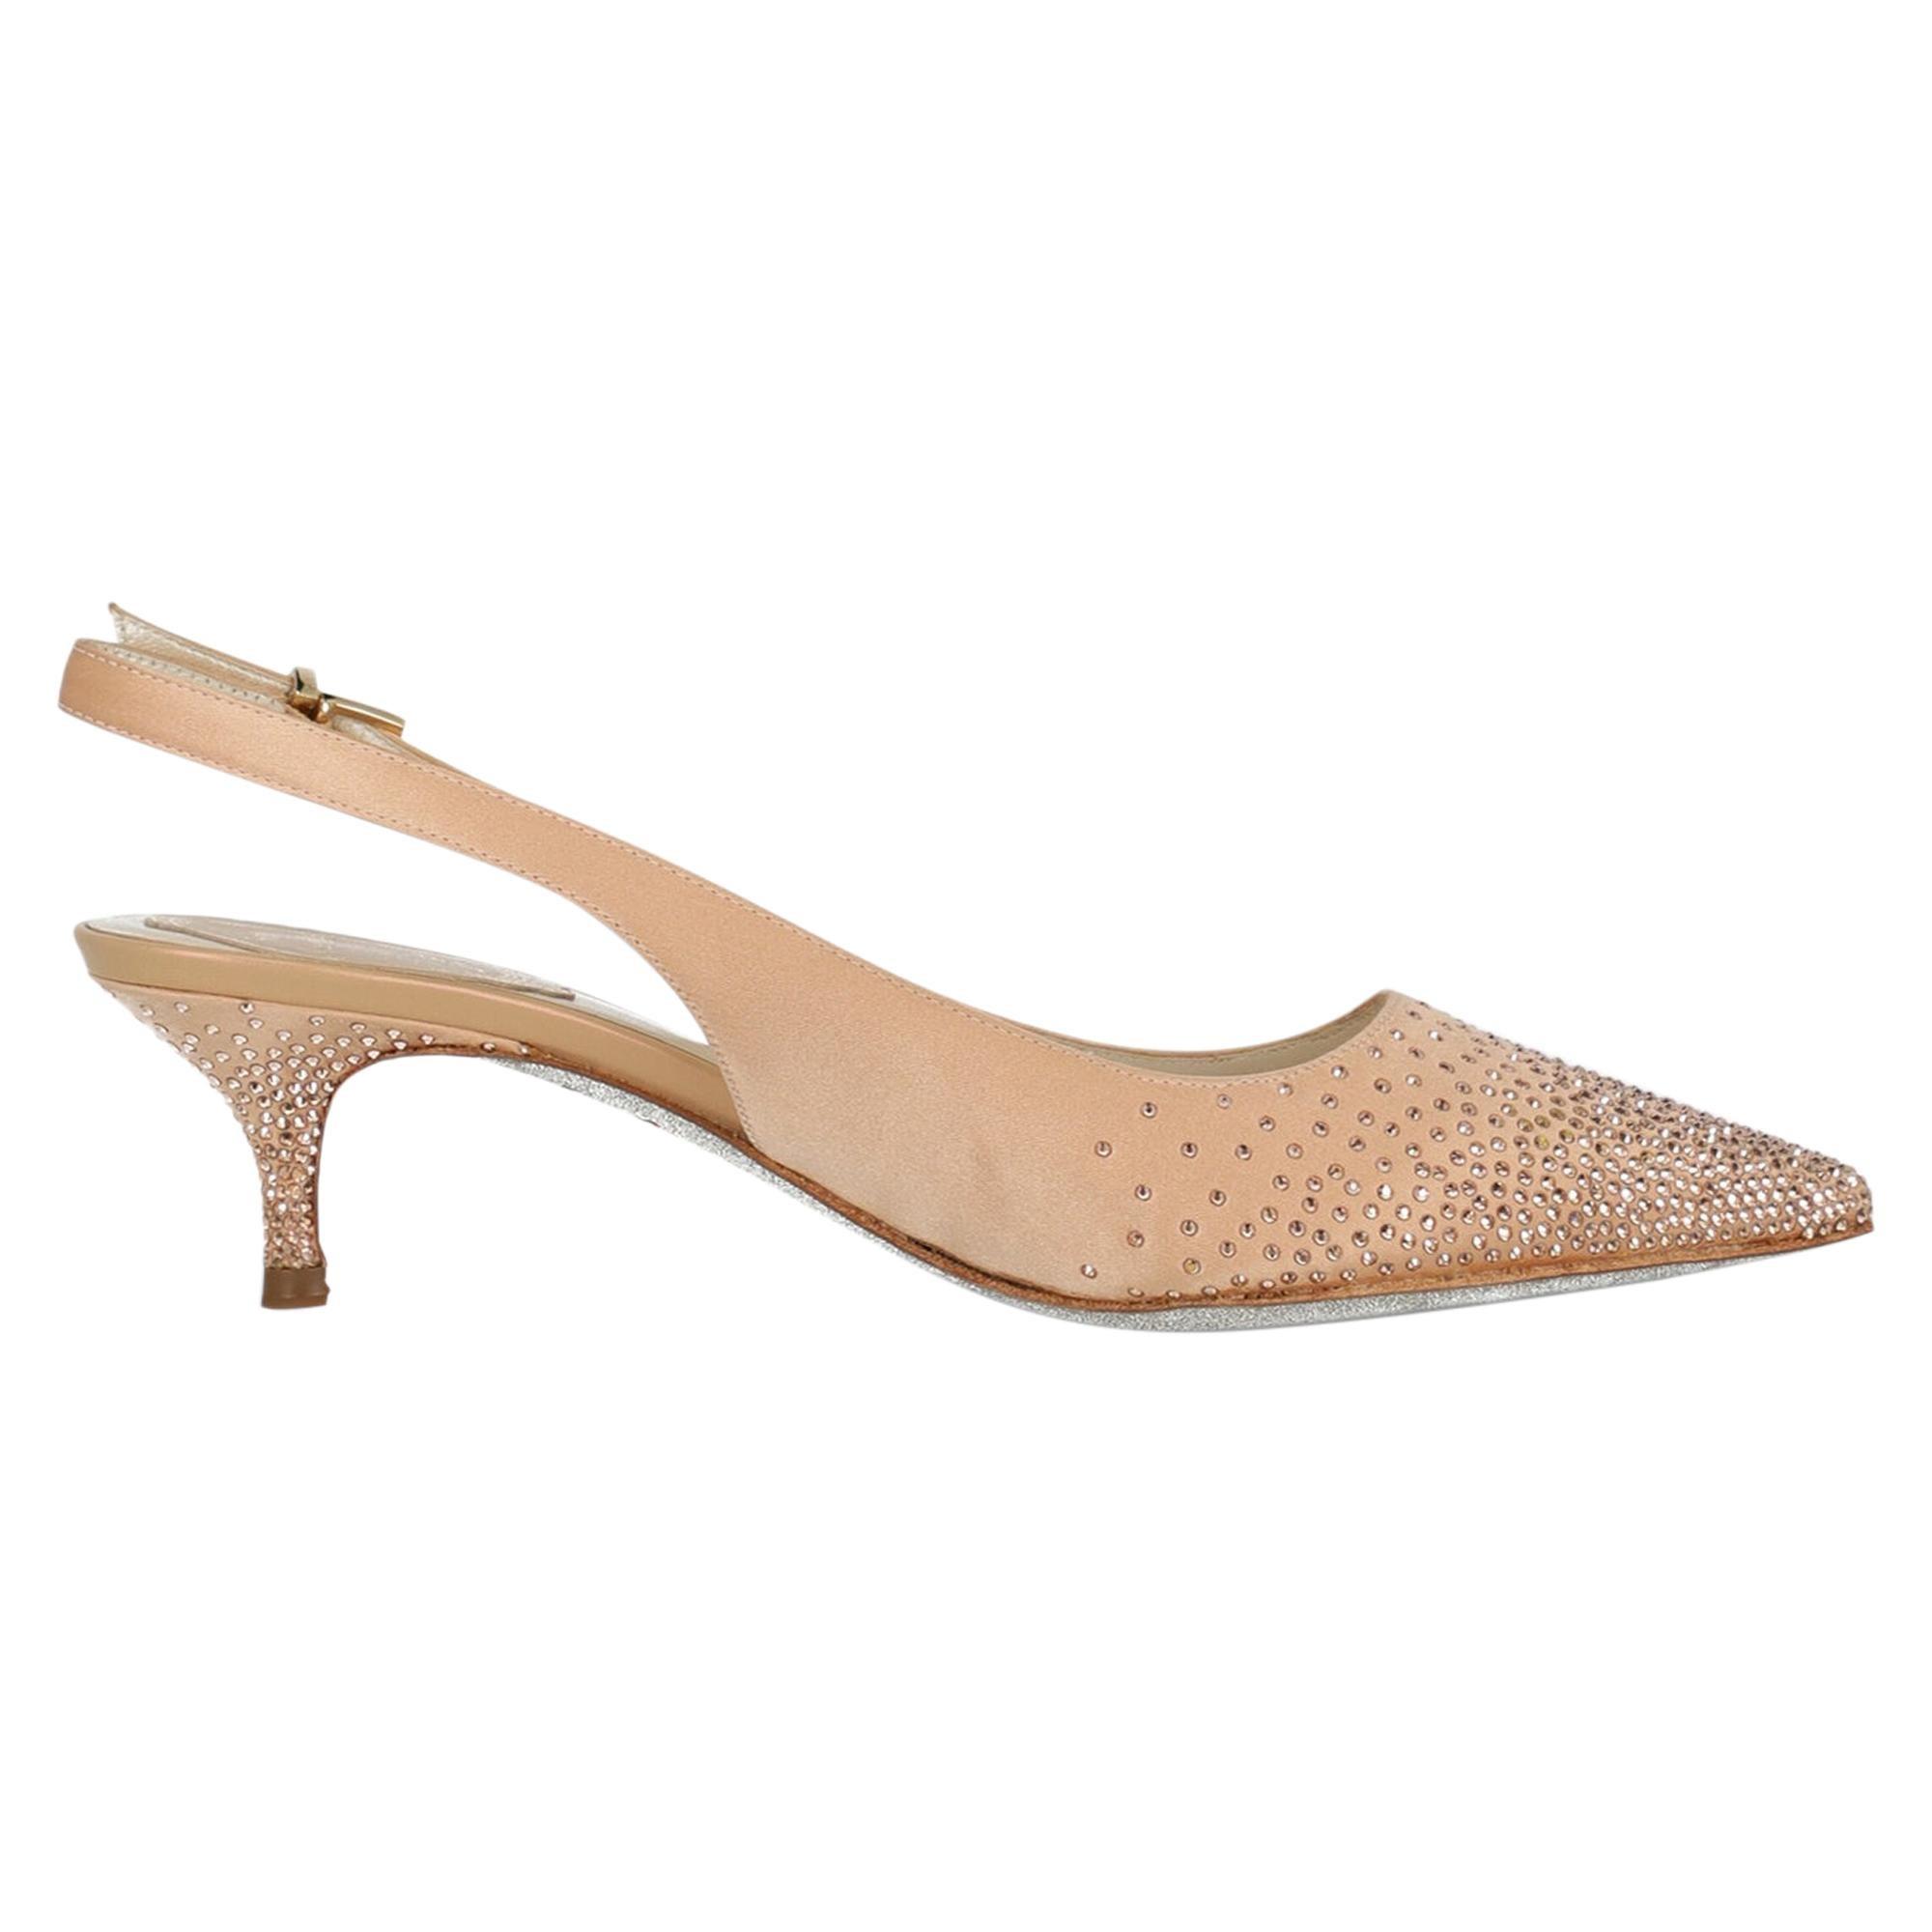 Rene Caovilla Woman Sale Pink Fabric IT 38